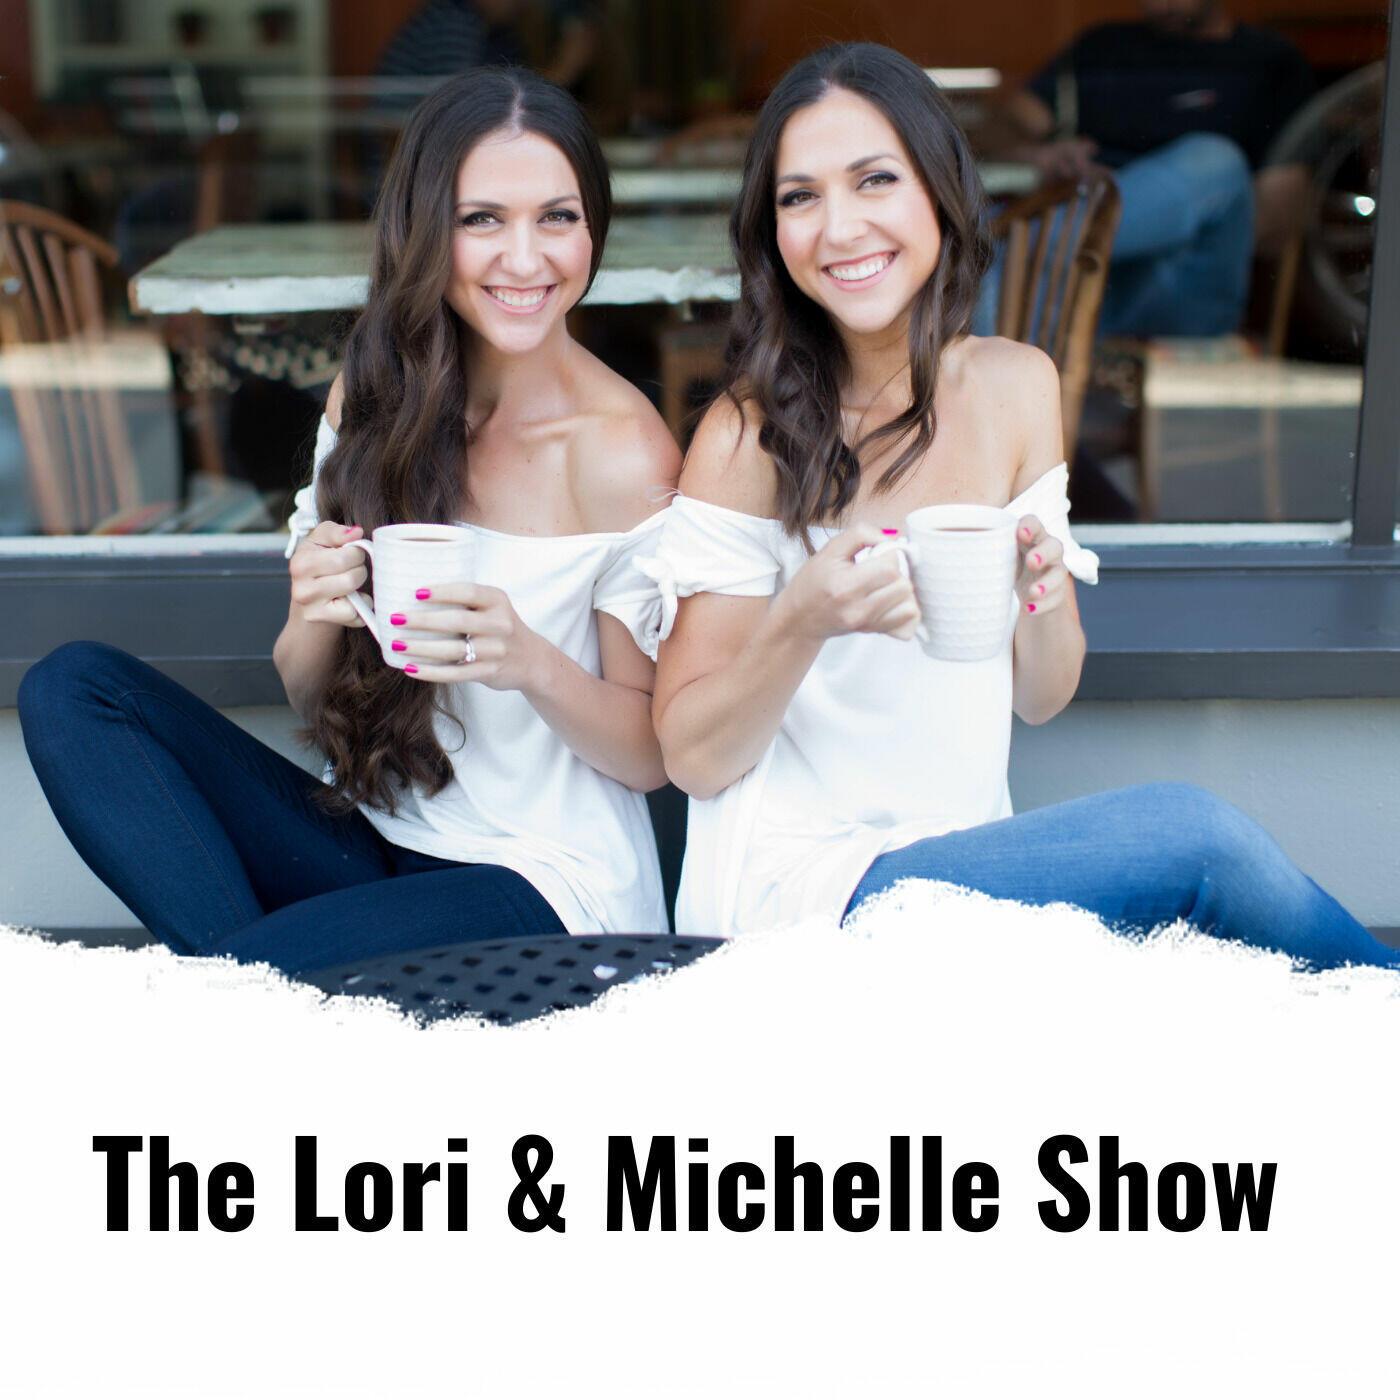 The Lori and Michelle Show